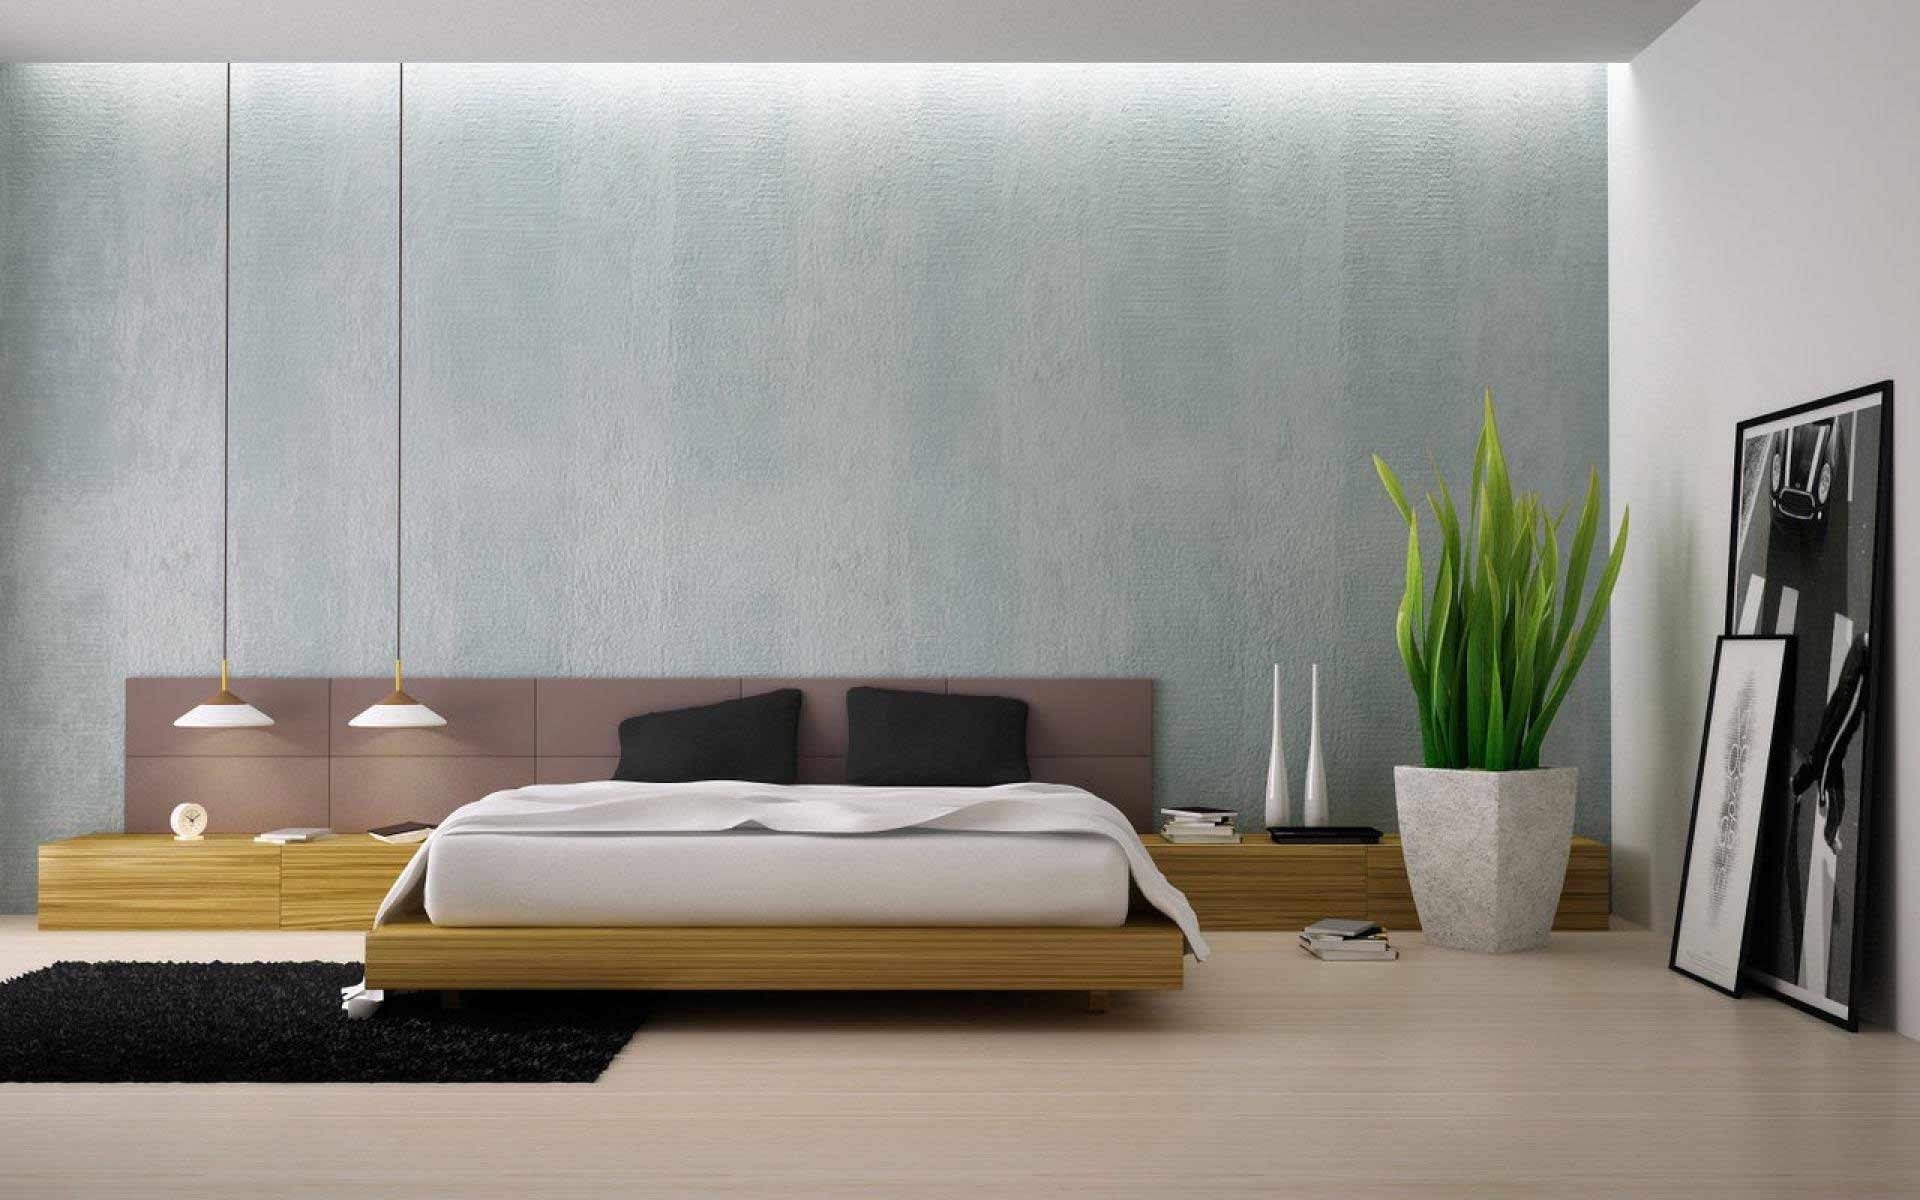 Дизайн-интерьера квартиры - выбор стиля